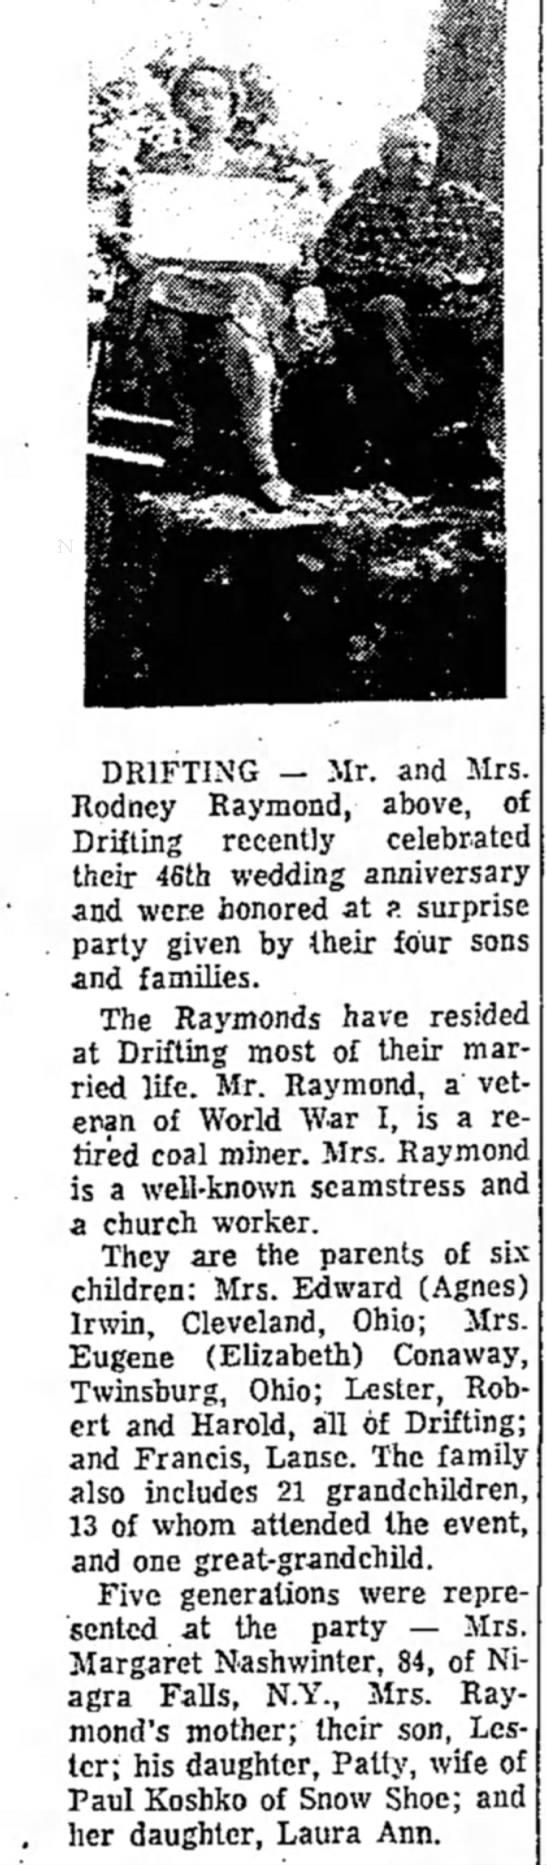 Rodney Raymond - DRIFTING — Mr. and Mrs. Rodney Raymond, above,...